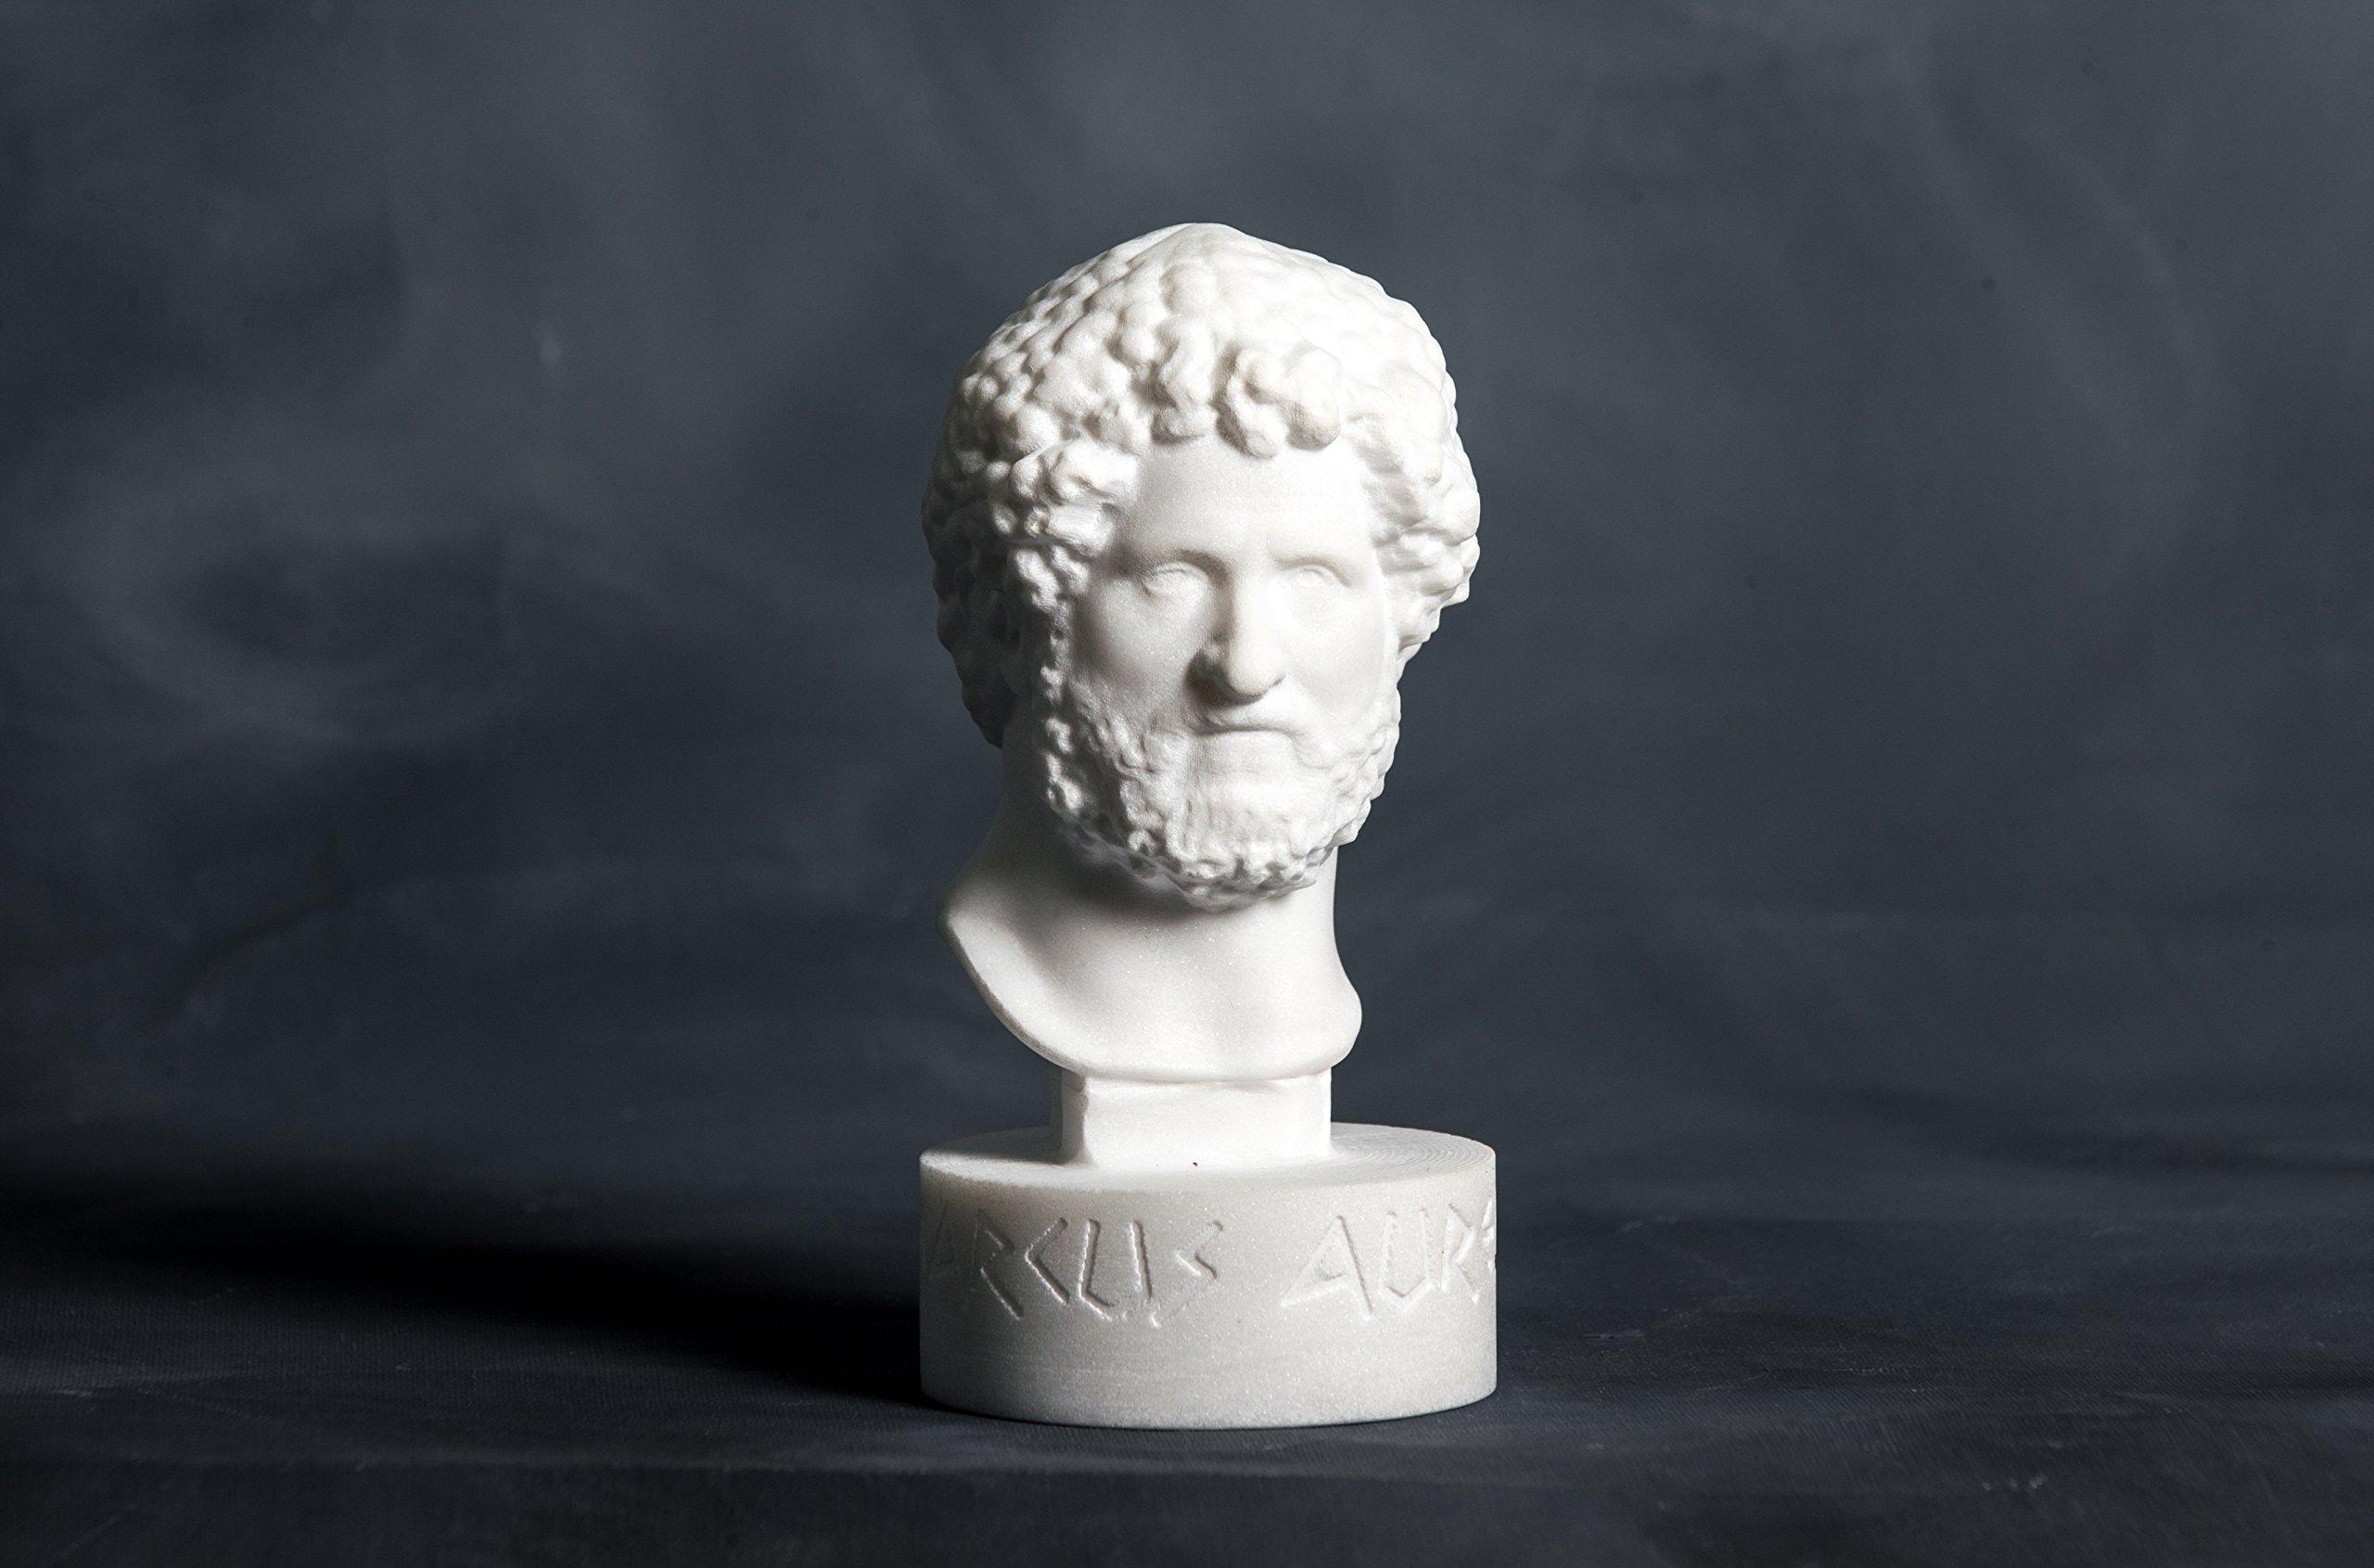 Bust of Marcus Aurelius Carved Greek Marble Statue Figurine Artist Sculpture